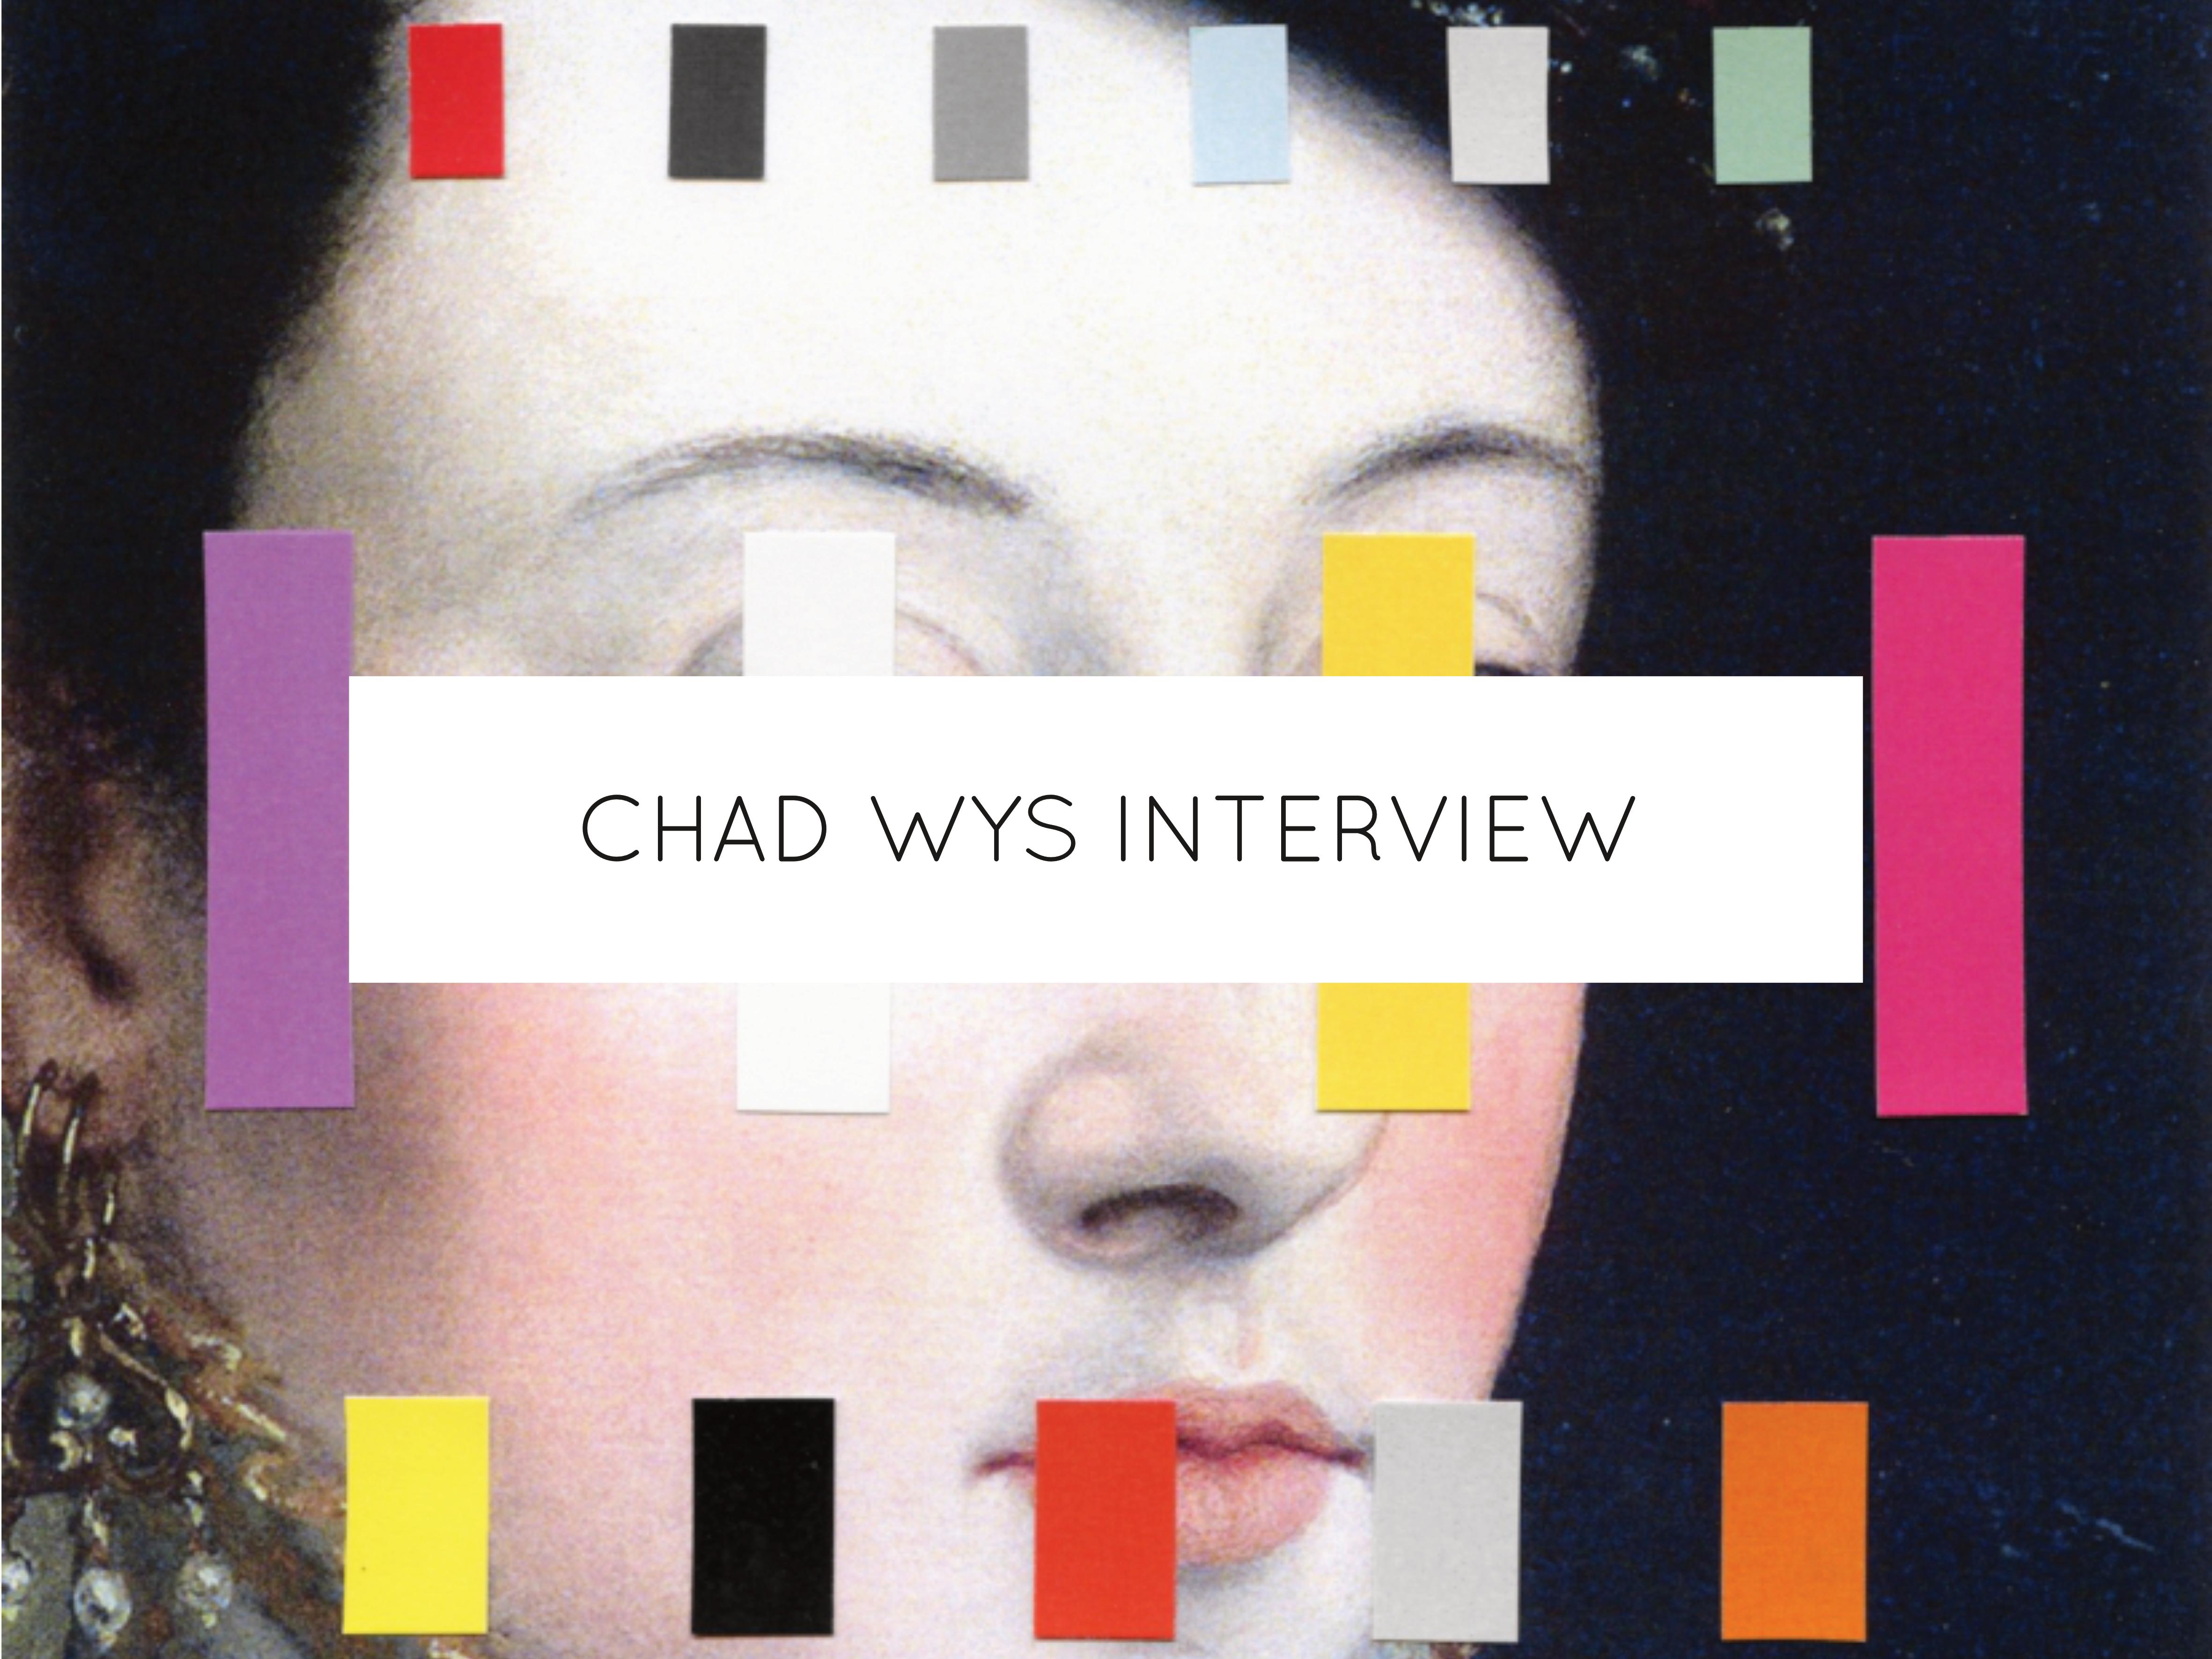 Evie cahir interview